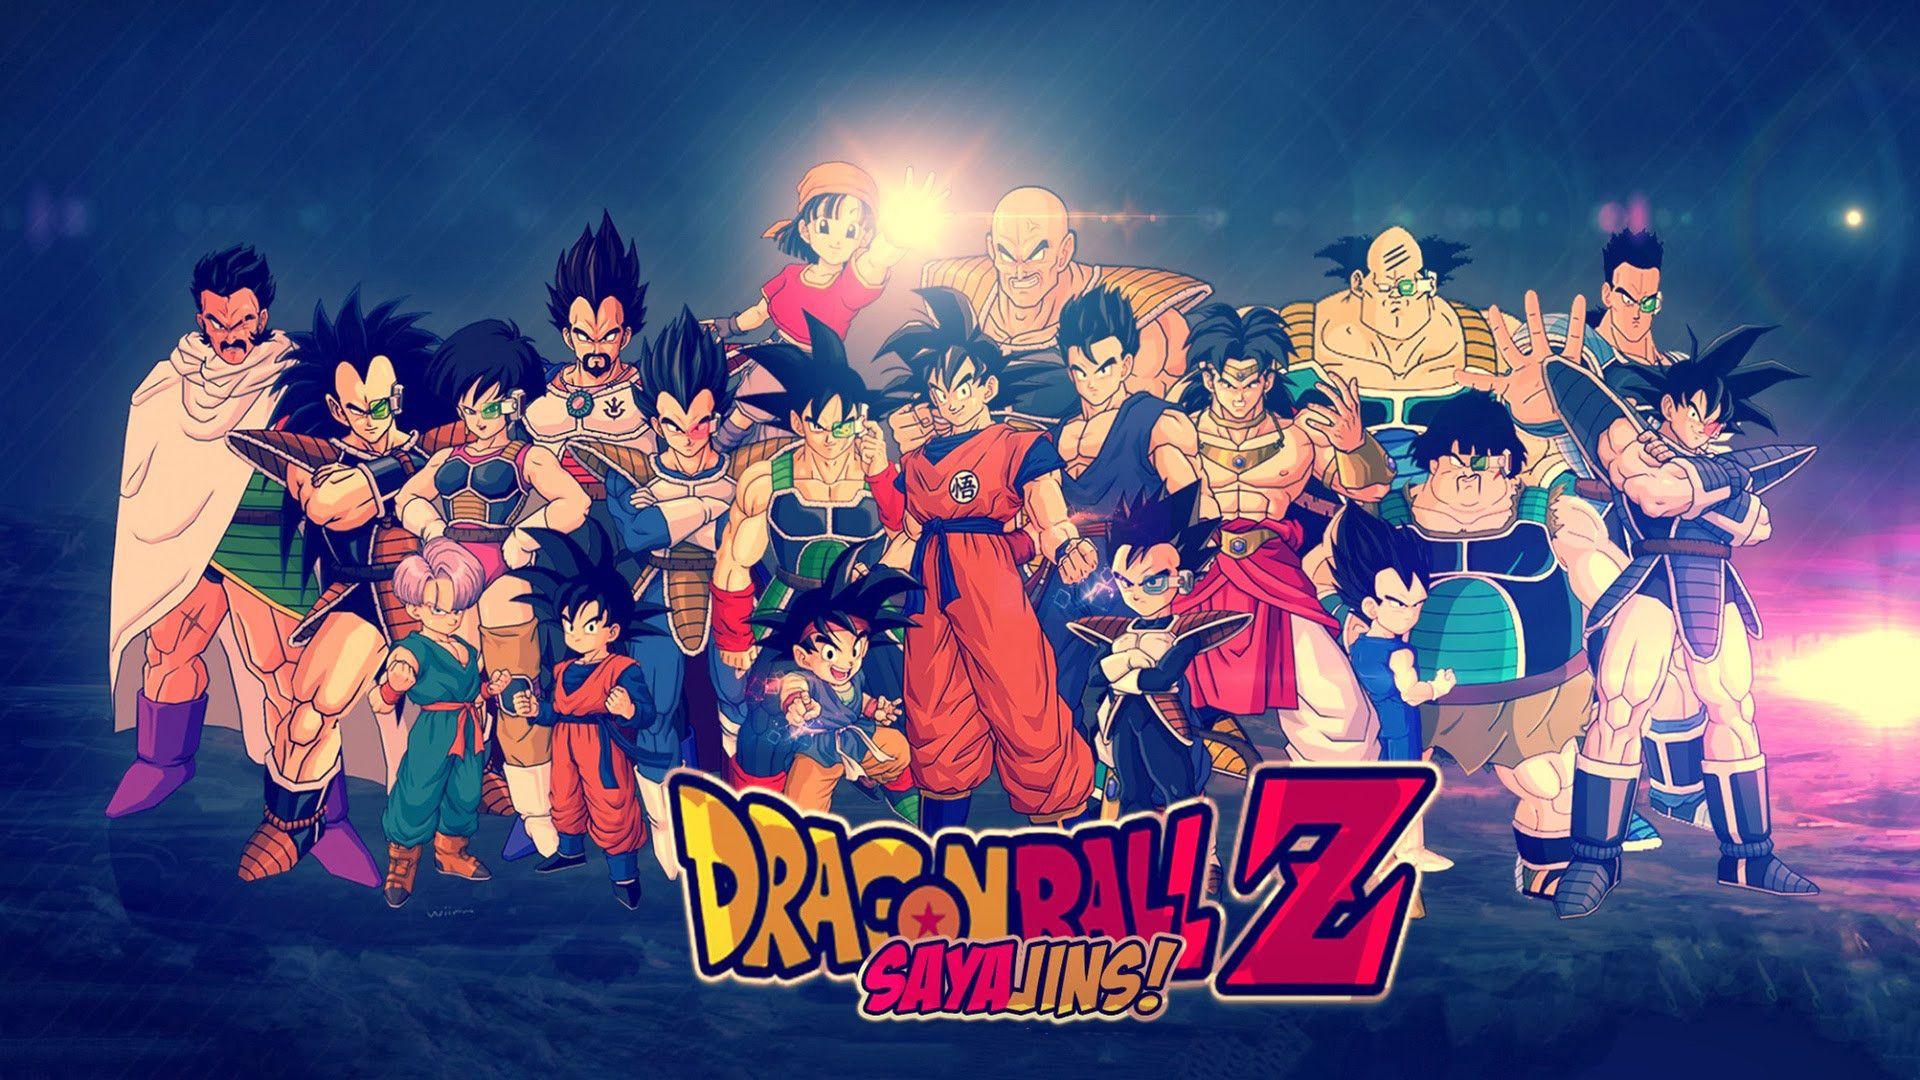 Dragon Ball Z Trunks Wallpaper 1920x1080 Tablet Dragon Ball Wallpapers Anime Dragon Ball Super Anime Dragon Ball